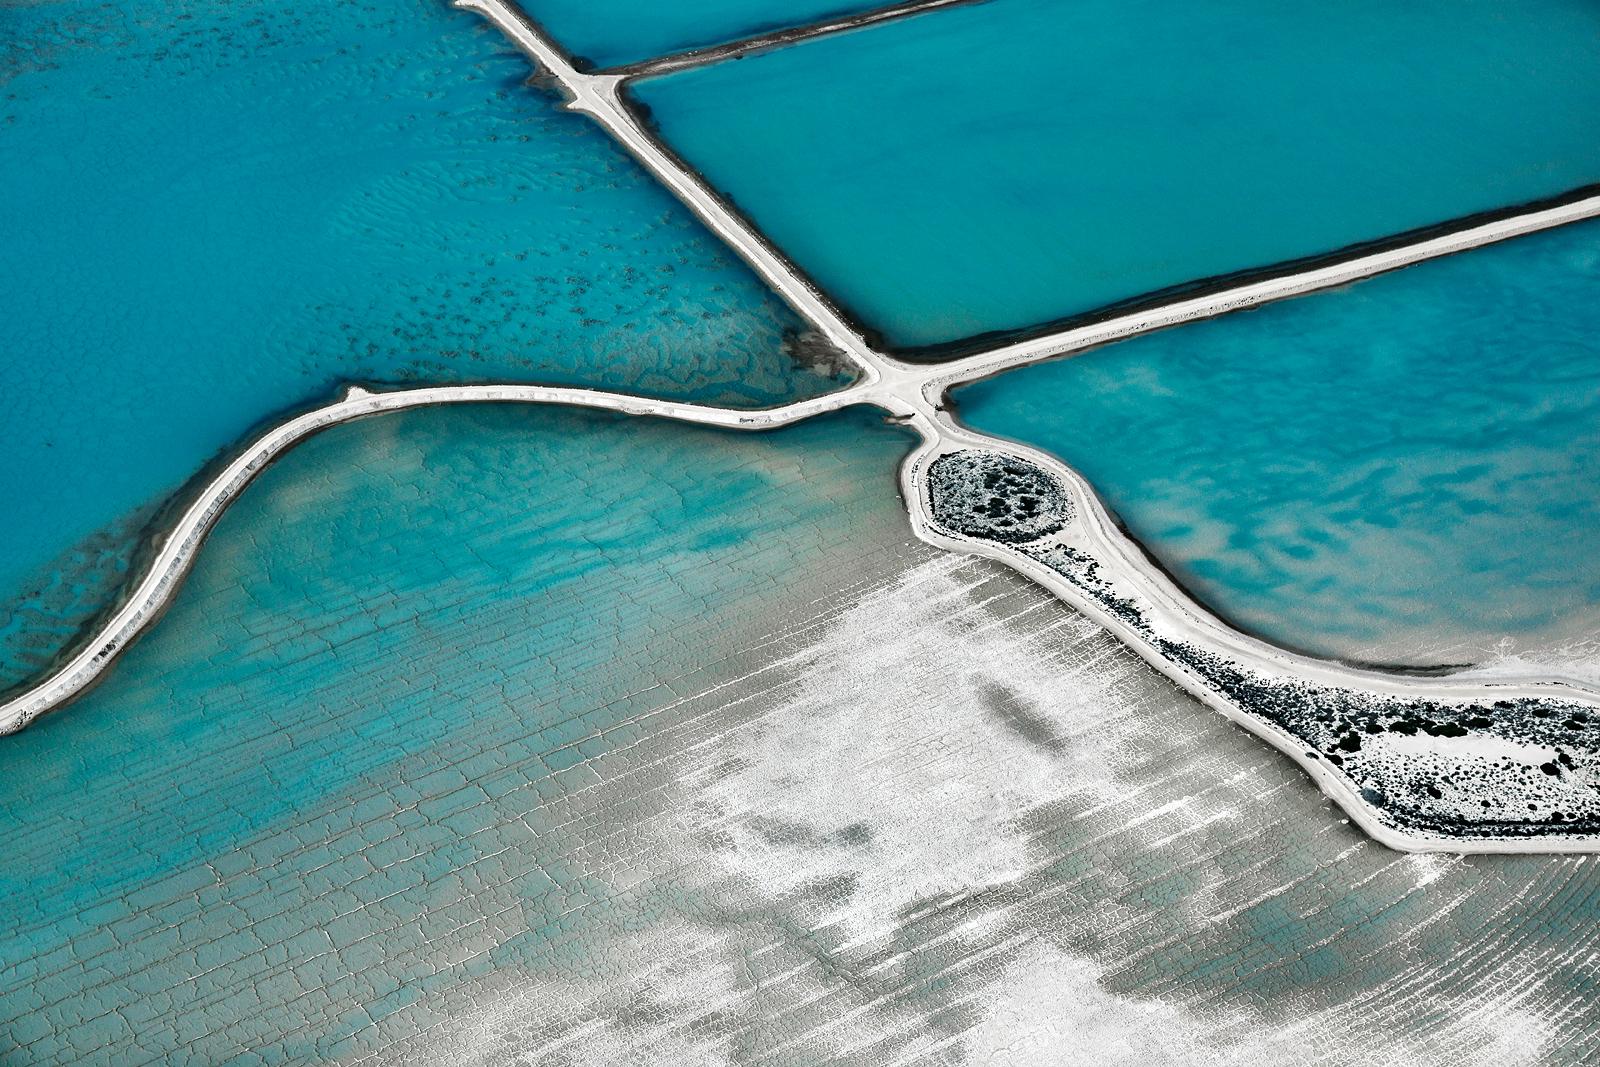 Useless Loop Aerial #2, Shark Bay WA